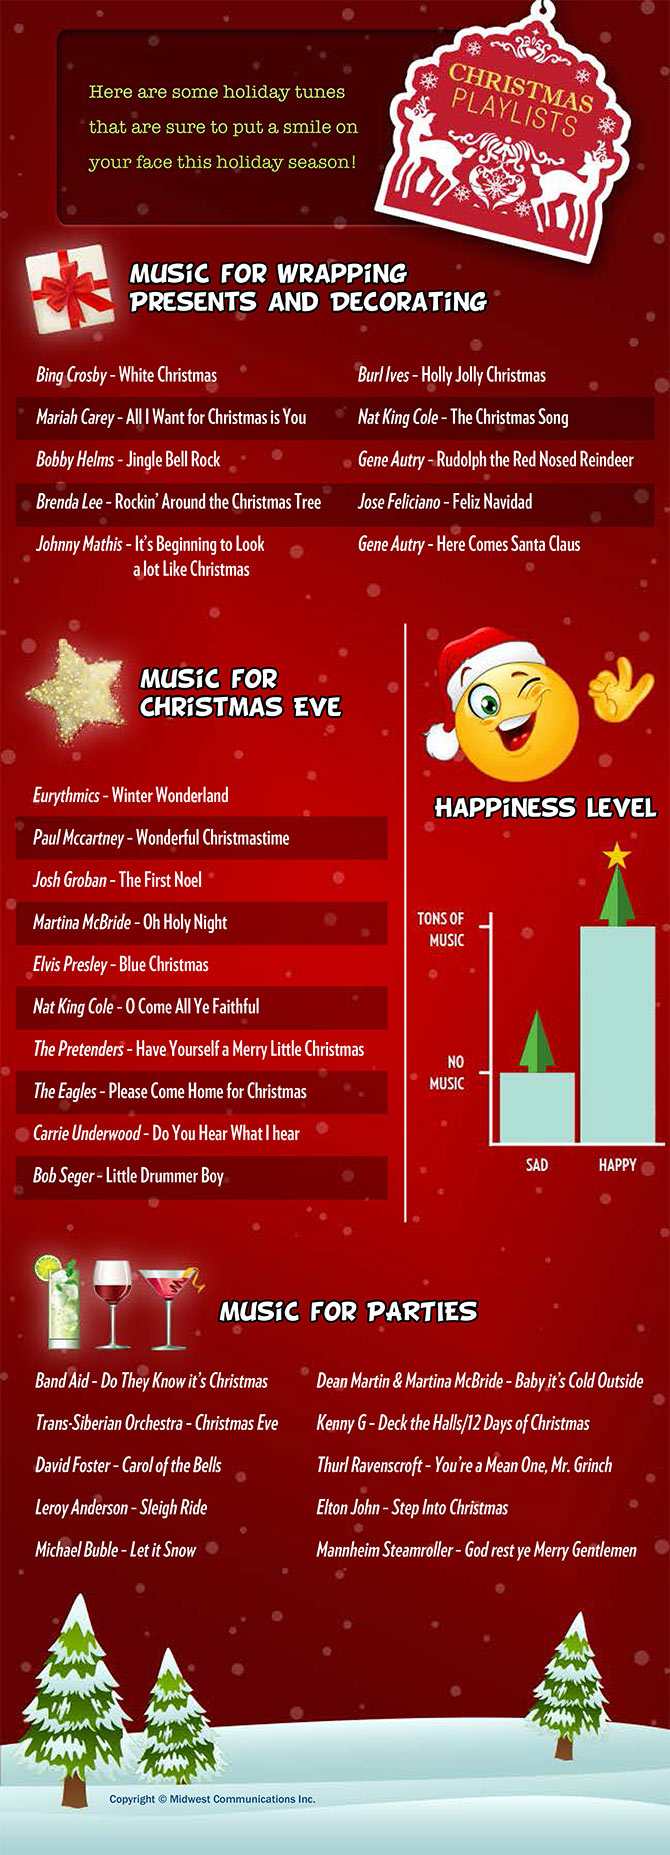 Rock Christmas Music.Christmas Music Playlists Holiday Help Holidays Rock